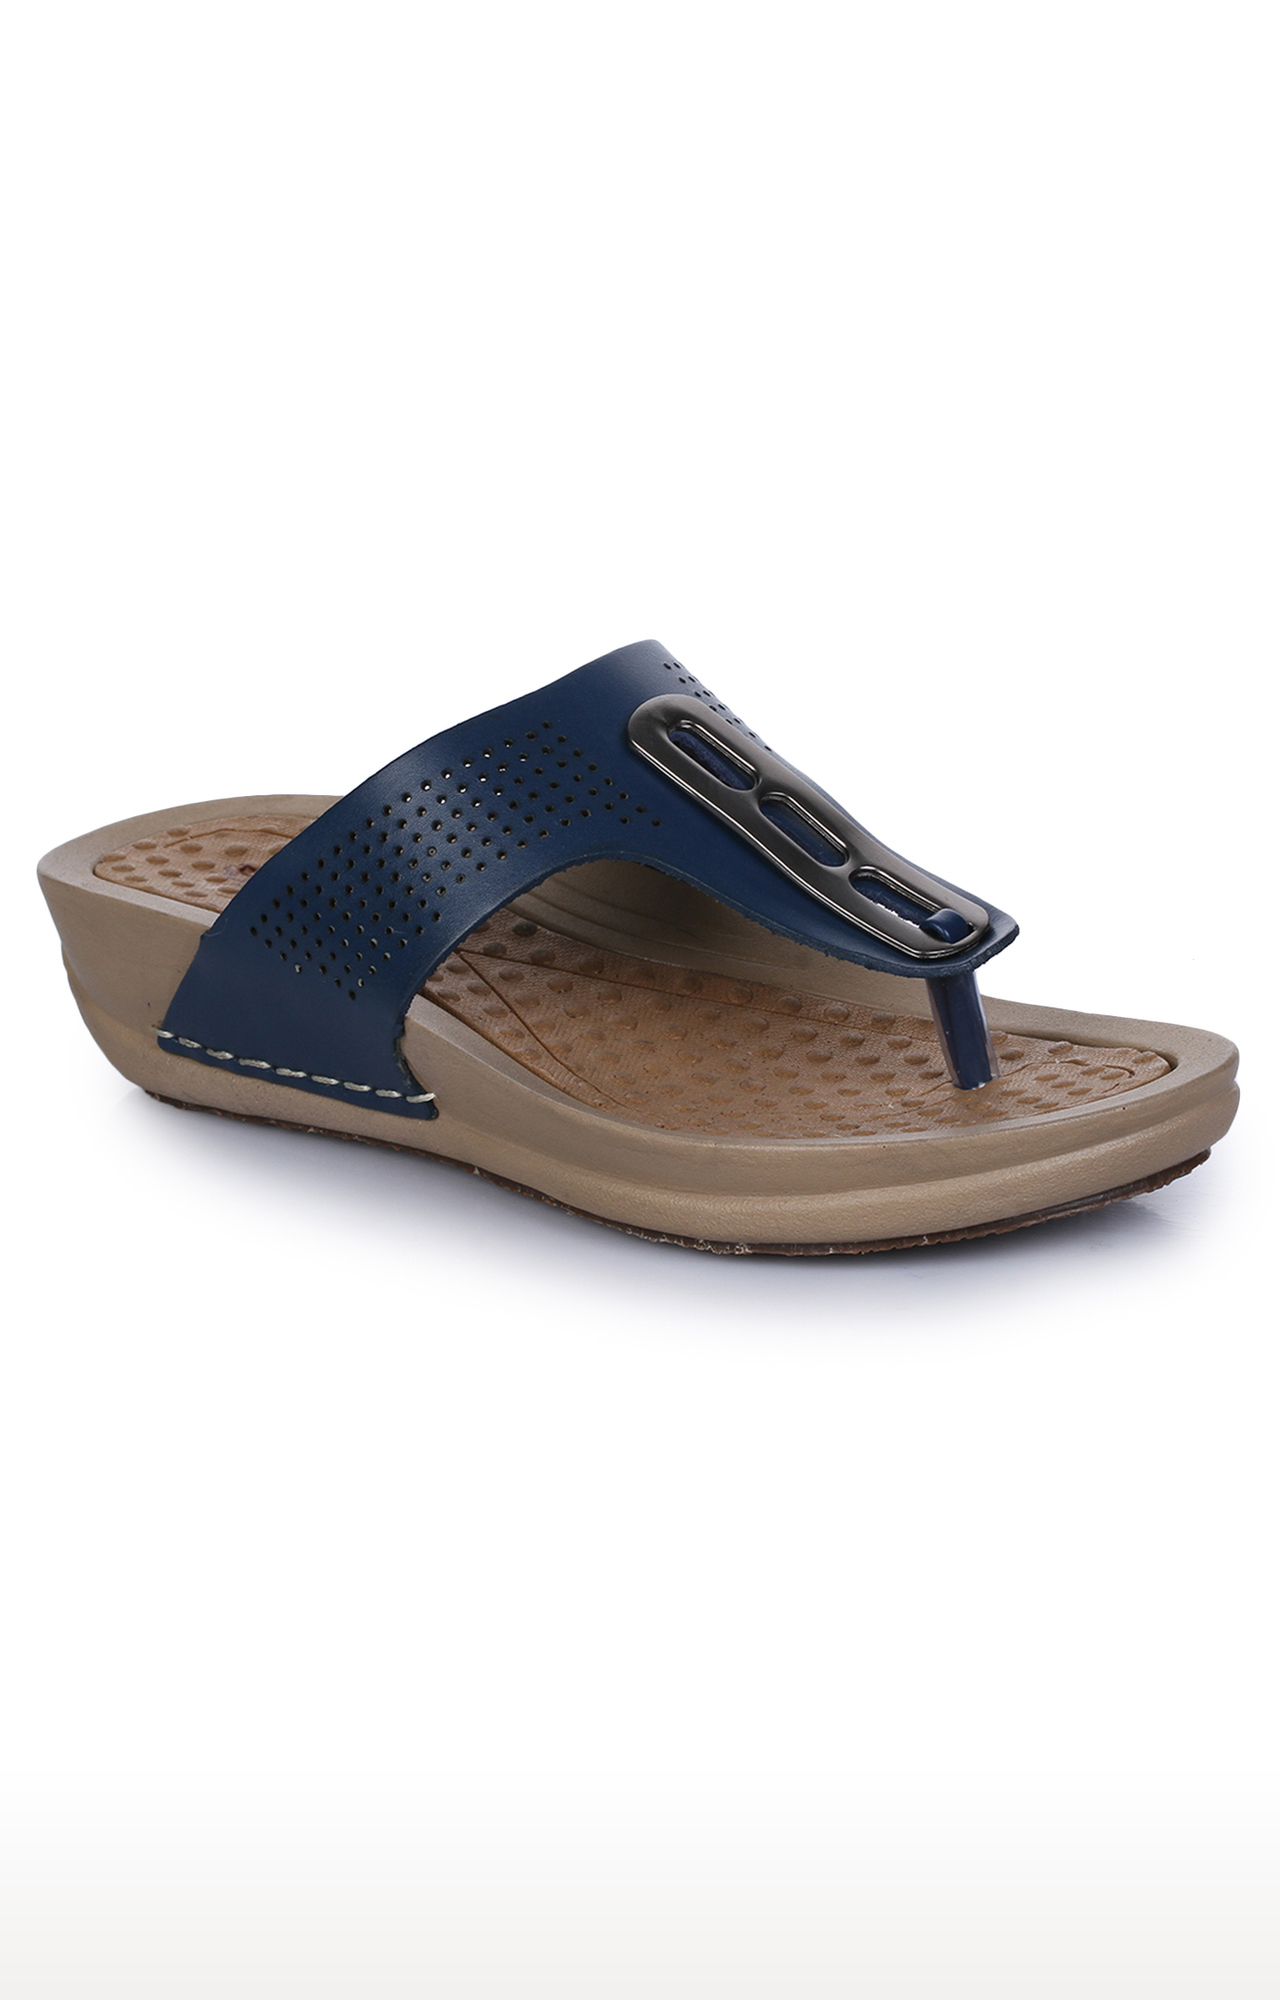 Liberty | Senorita by Liberty Blue Sandals